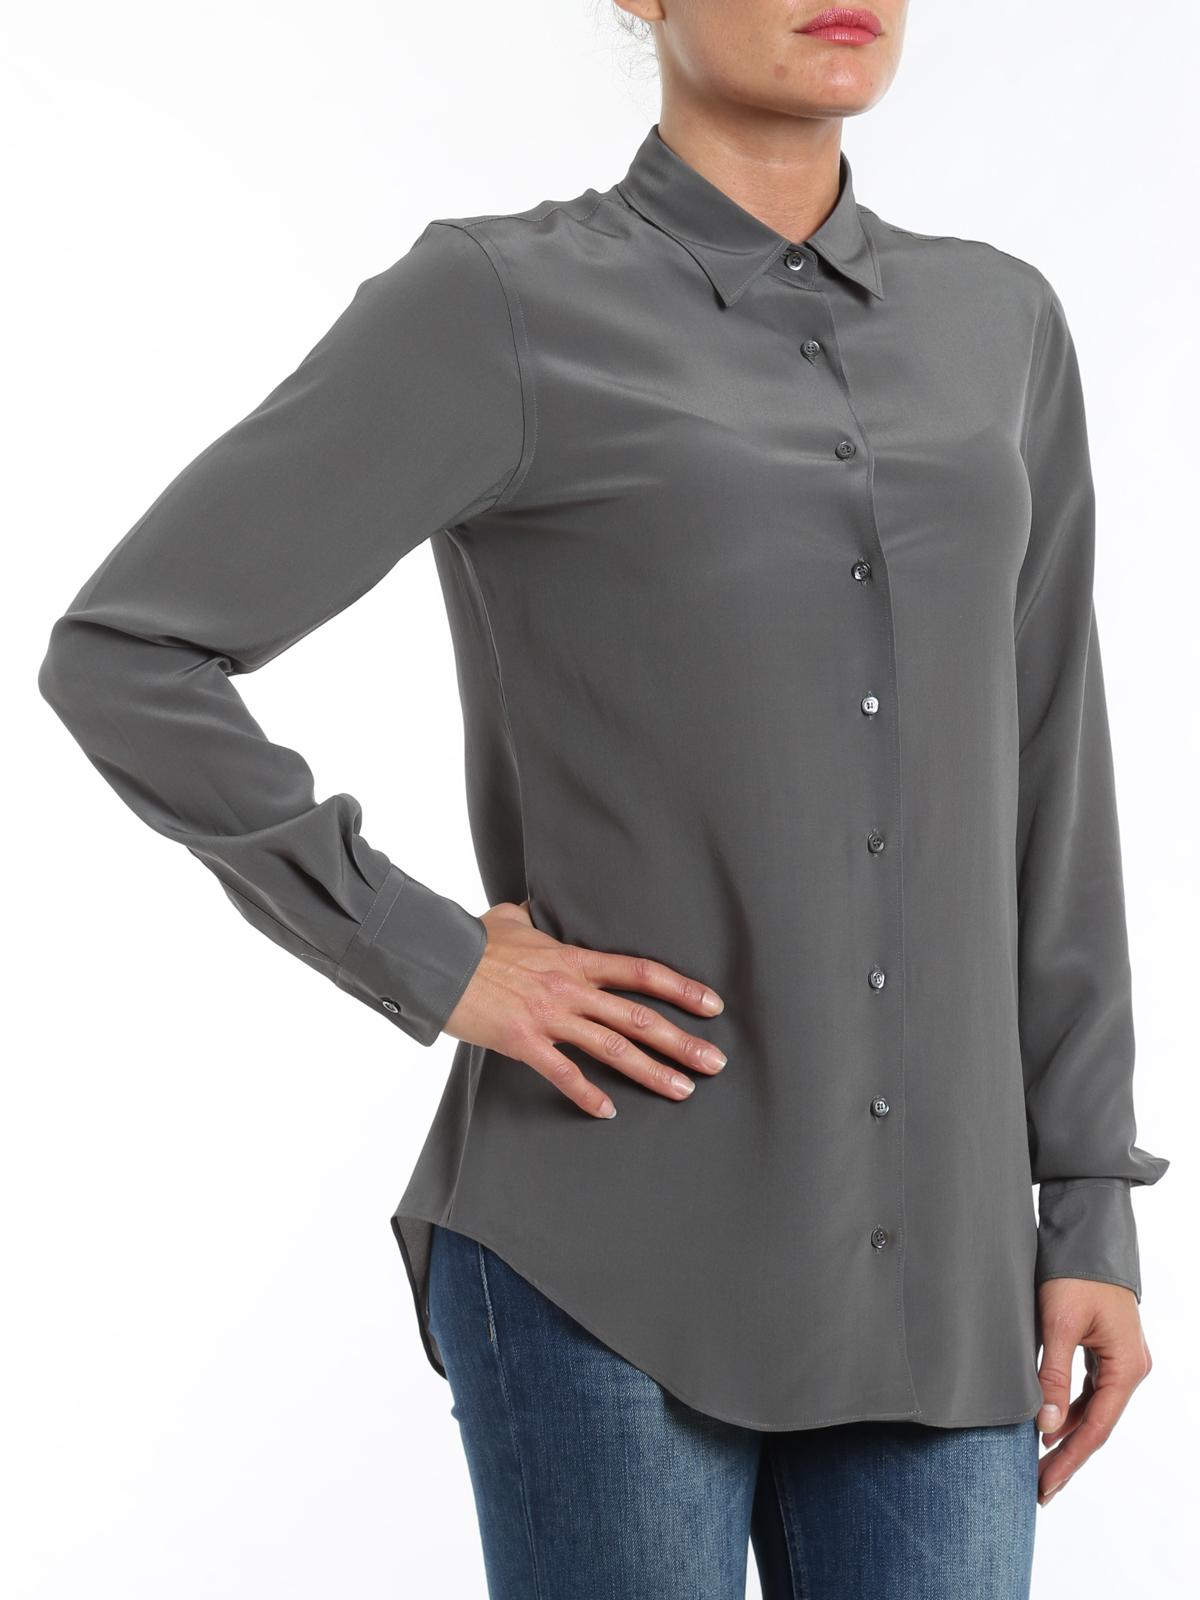 96a2ed4d4 Aspesi - Camisa Gris Para Mujer - Camisas - I5 G 5434 2753 5188